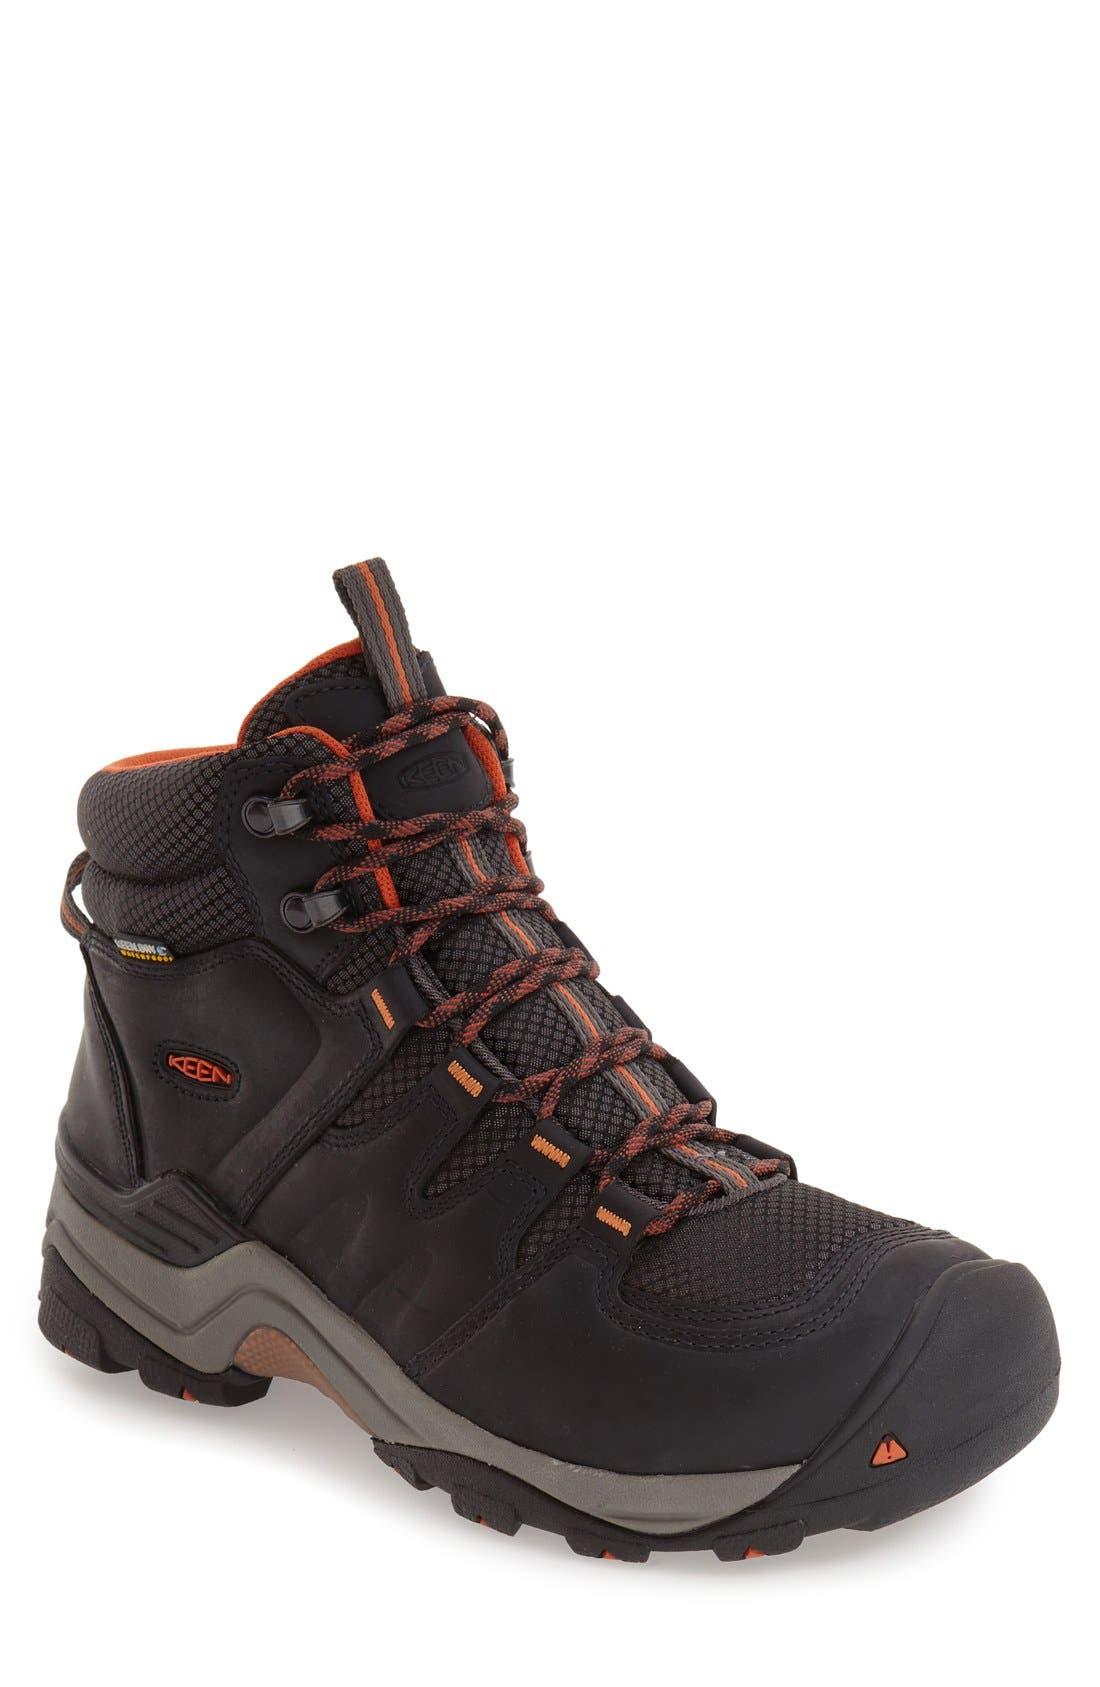 Gypsum II Waterproof Hiking Boot,                             Main thumbnail 1, color,                             BLACK NUBUCK LEATHER